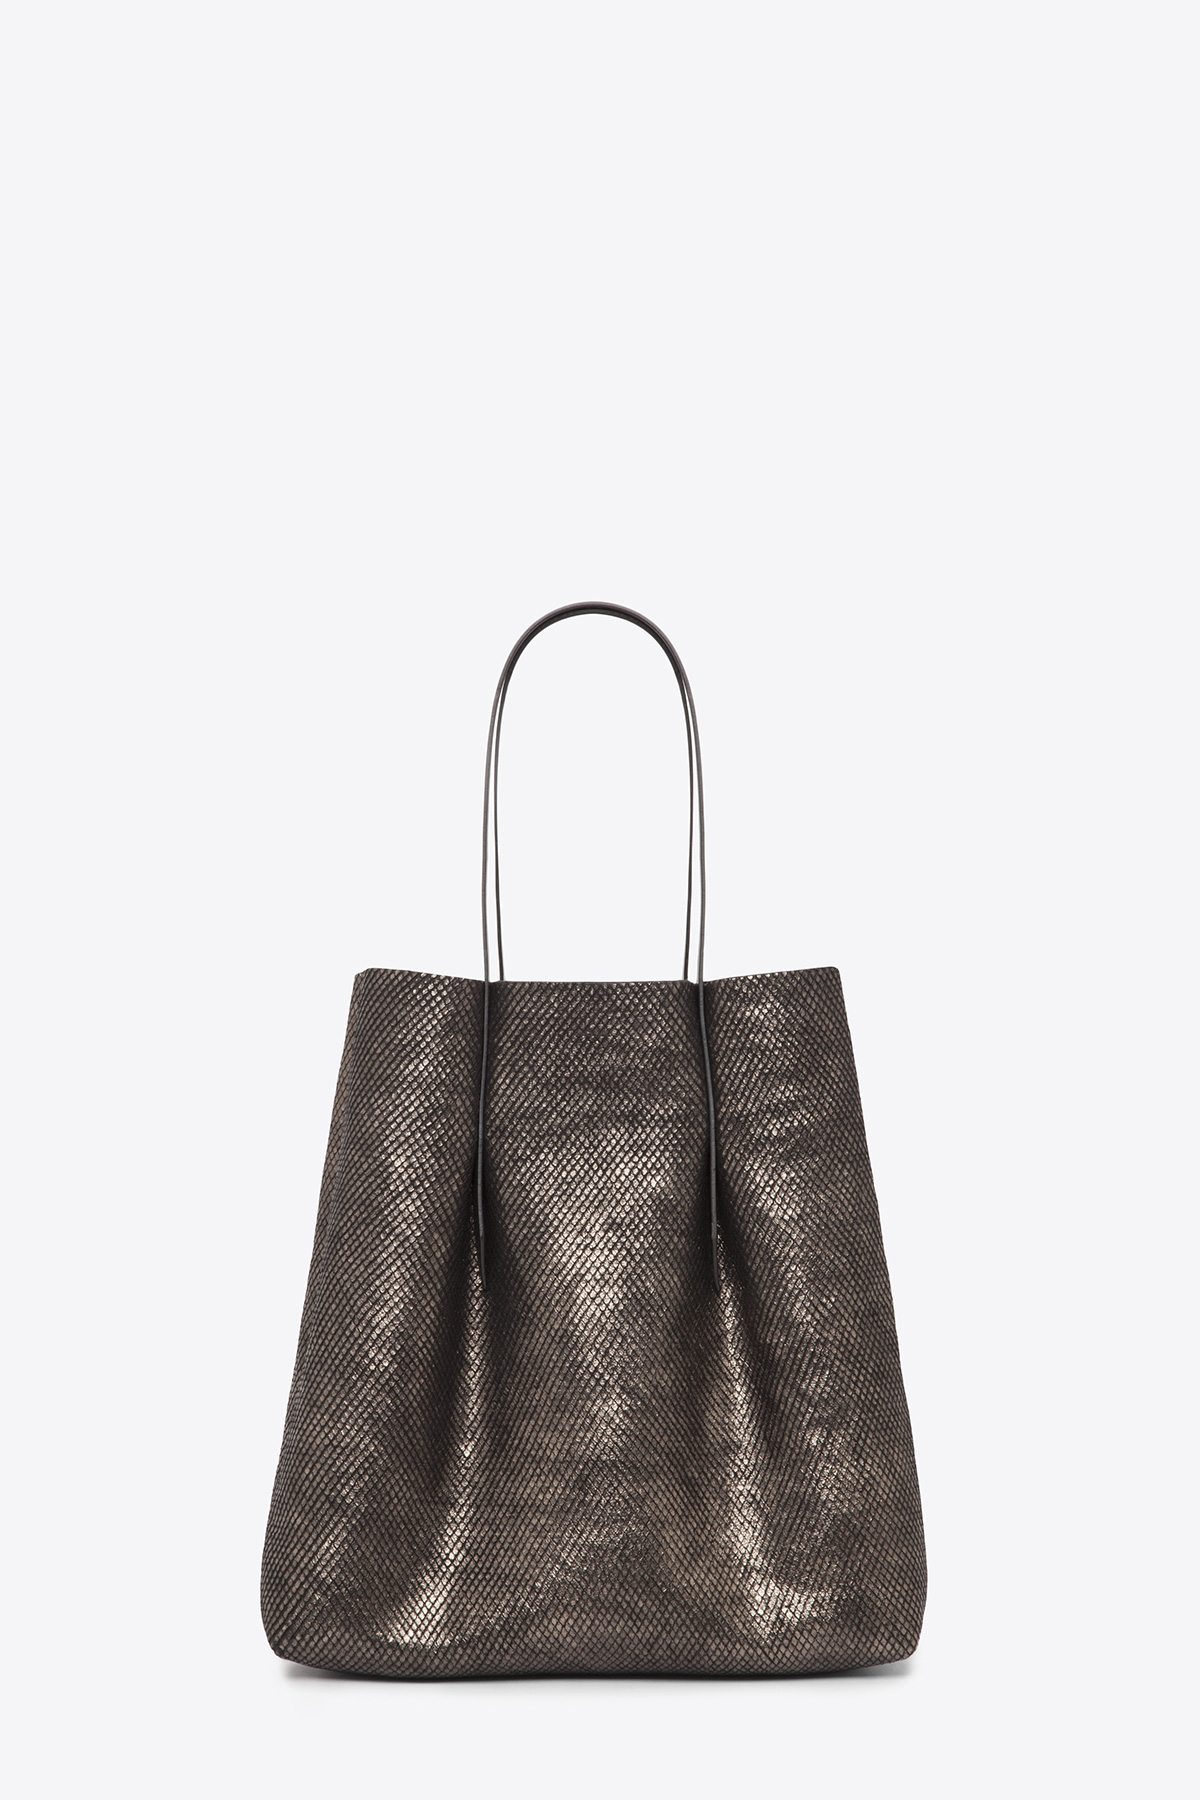 dclr006-shoppingbag-a24-backsnakebronze-front